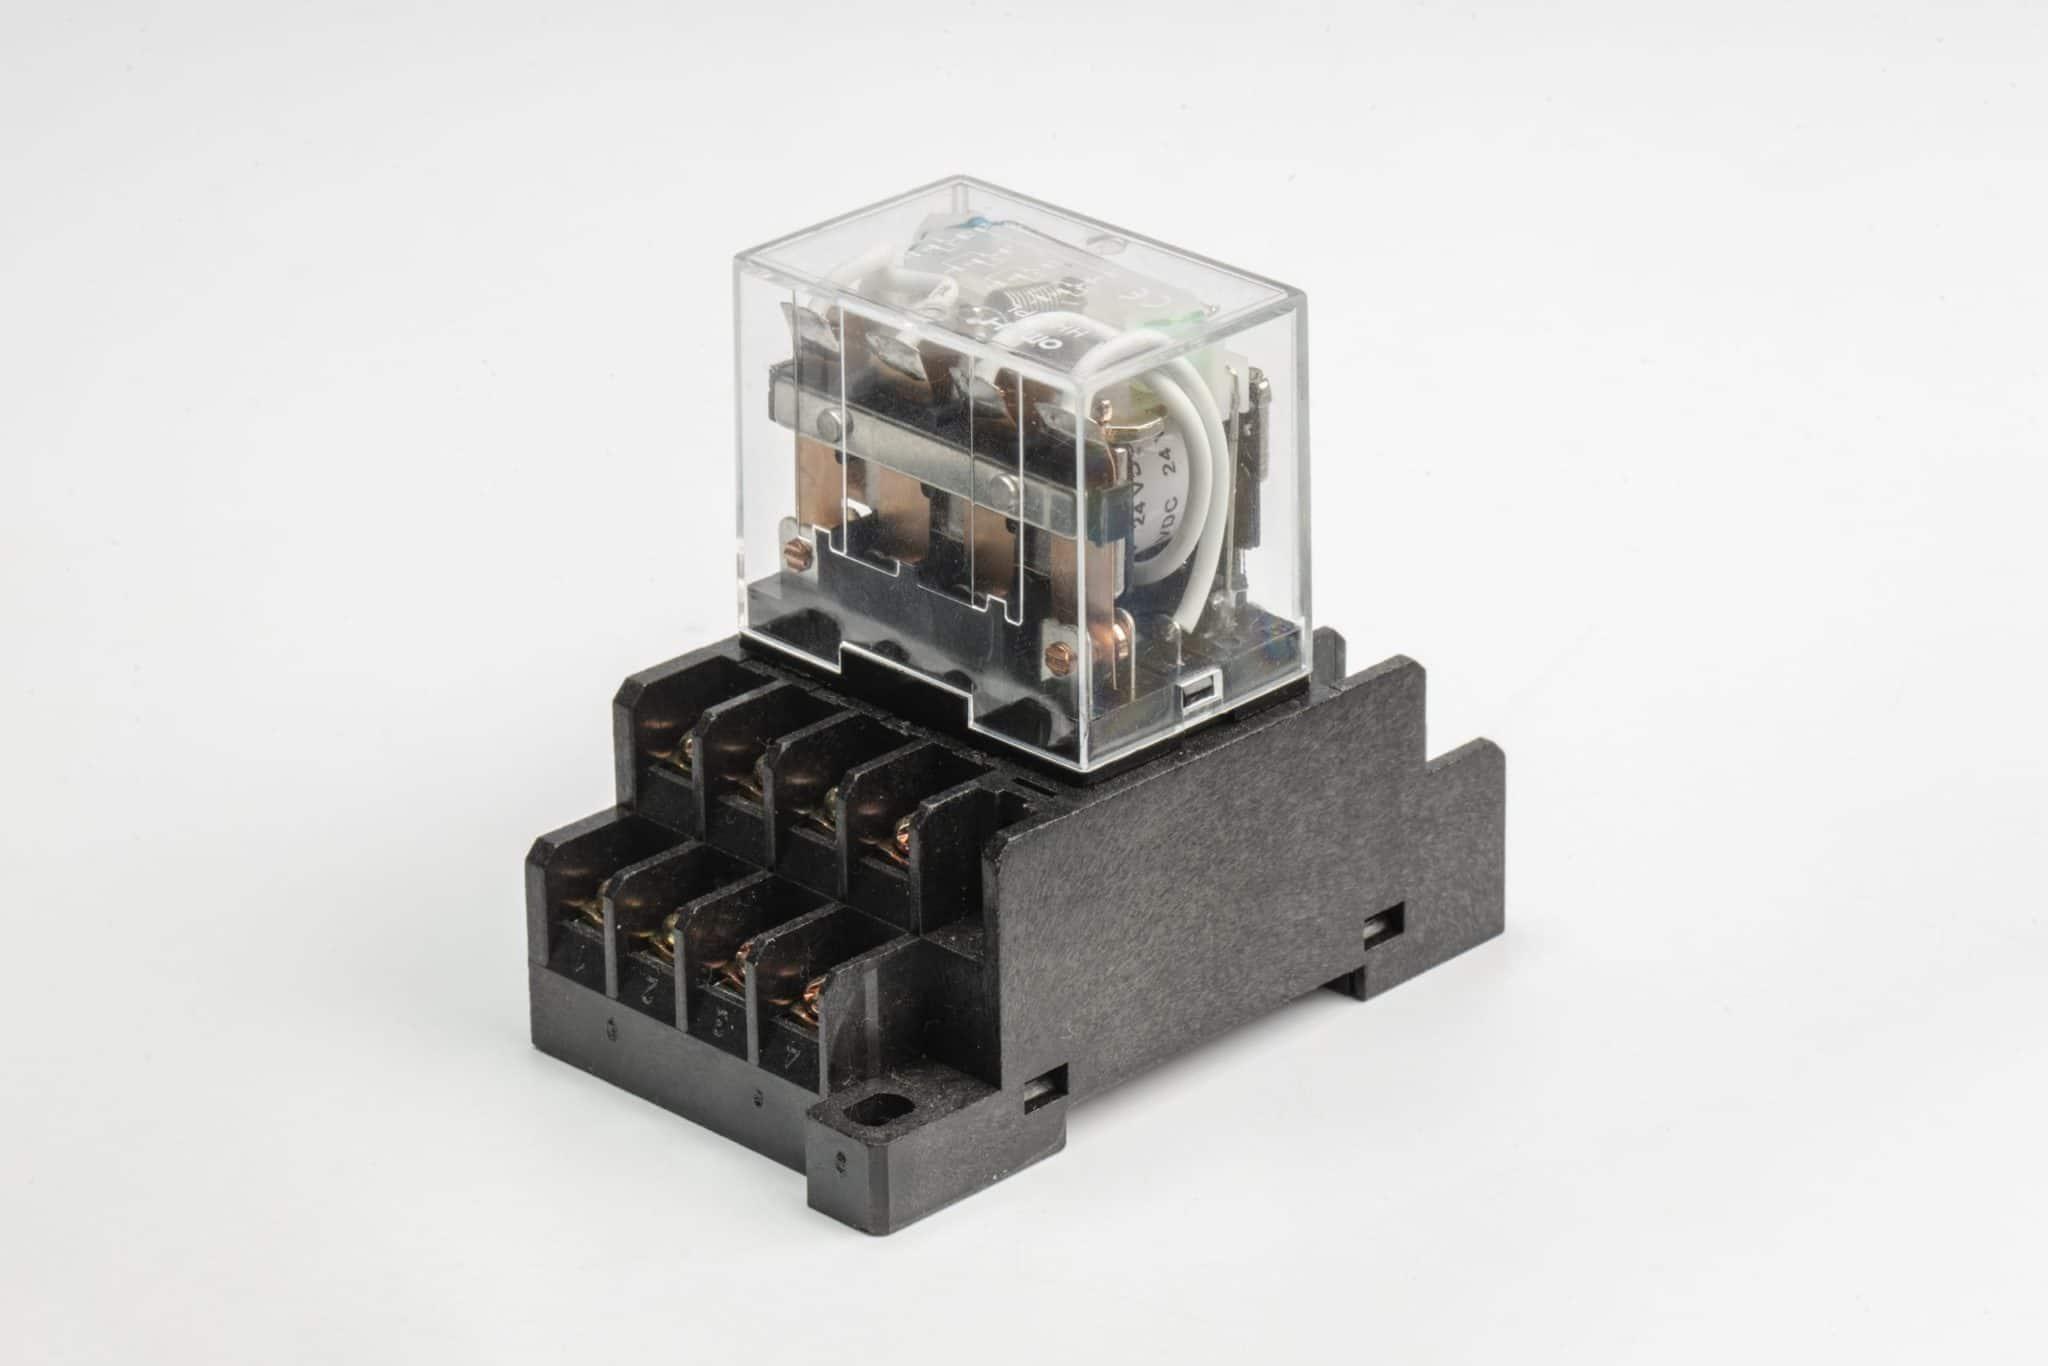 power relay